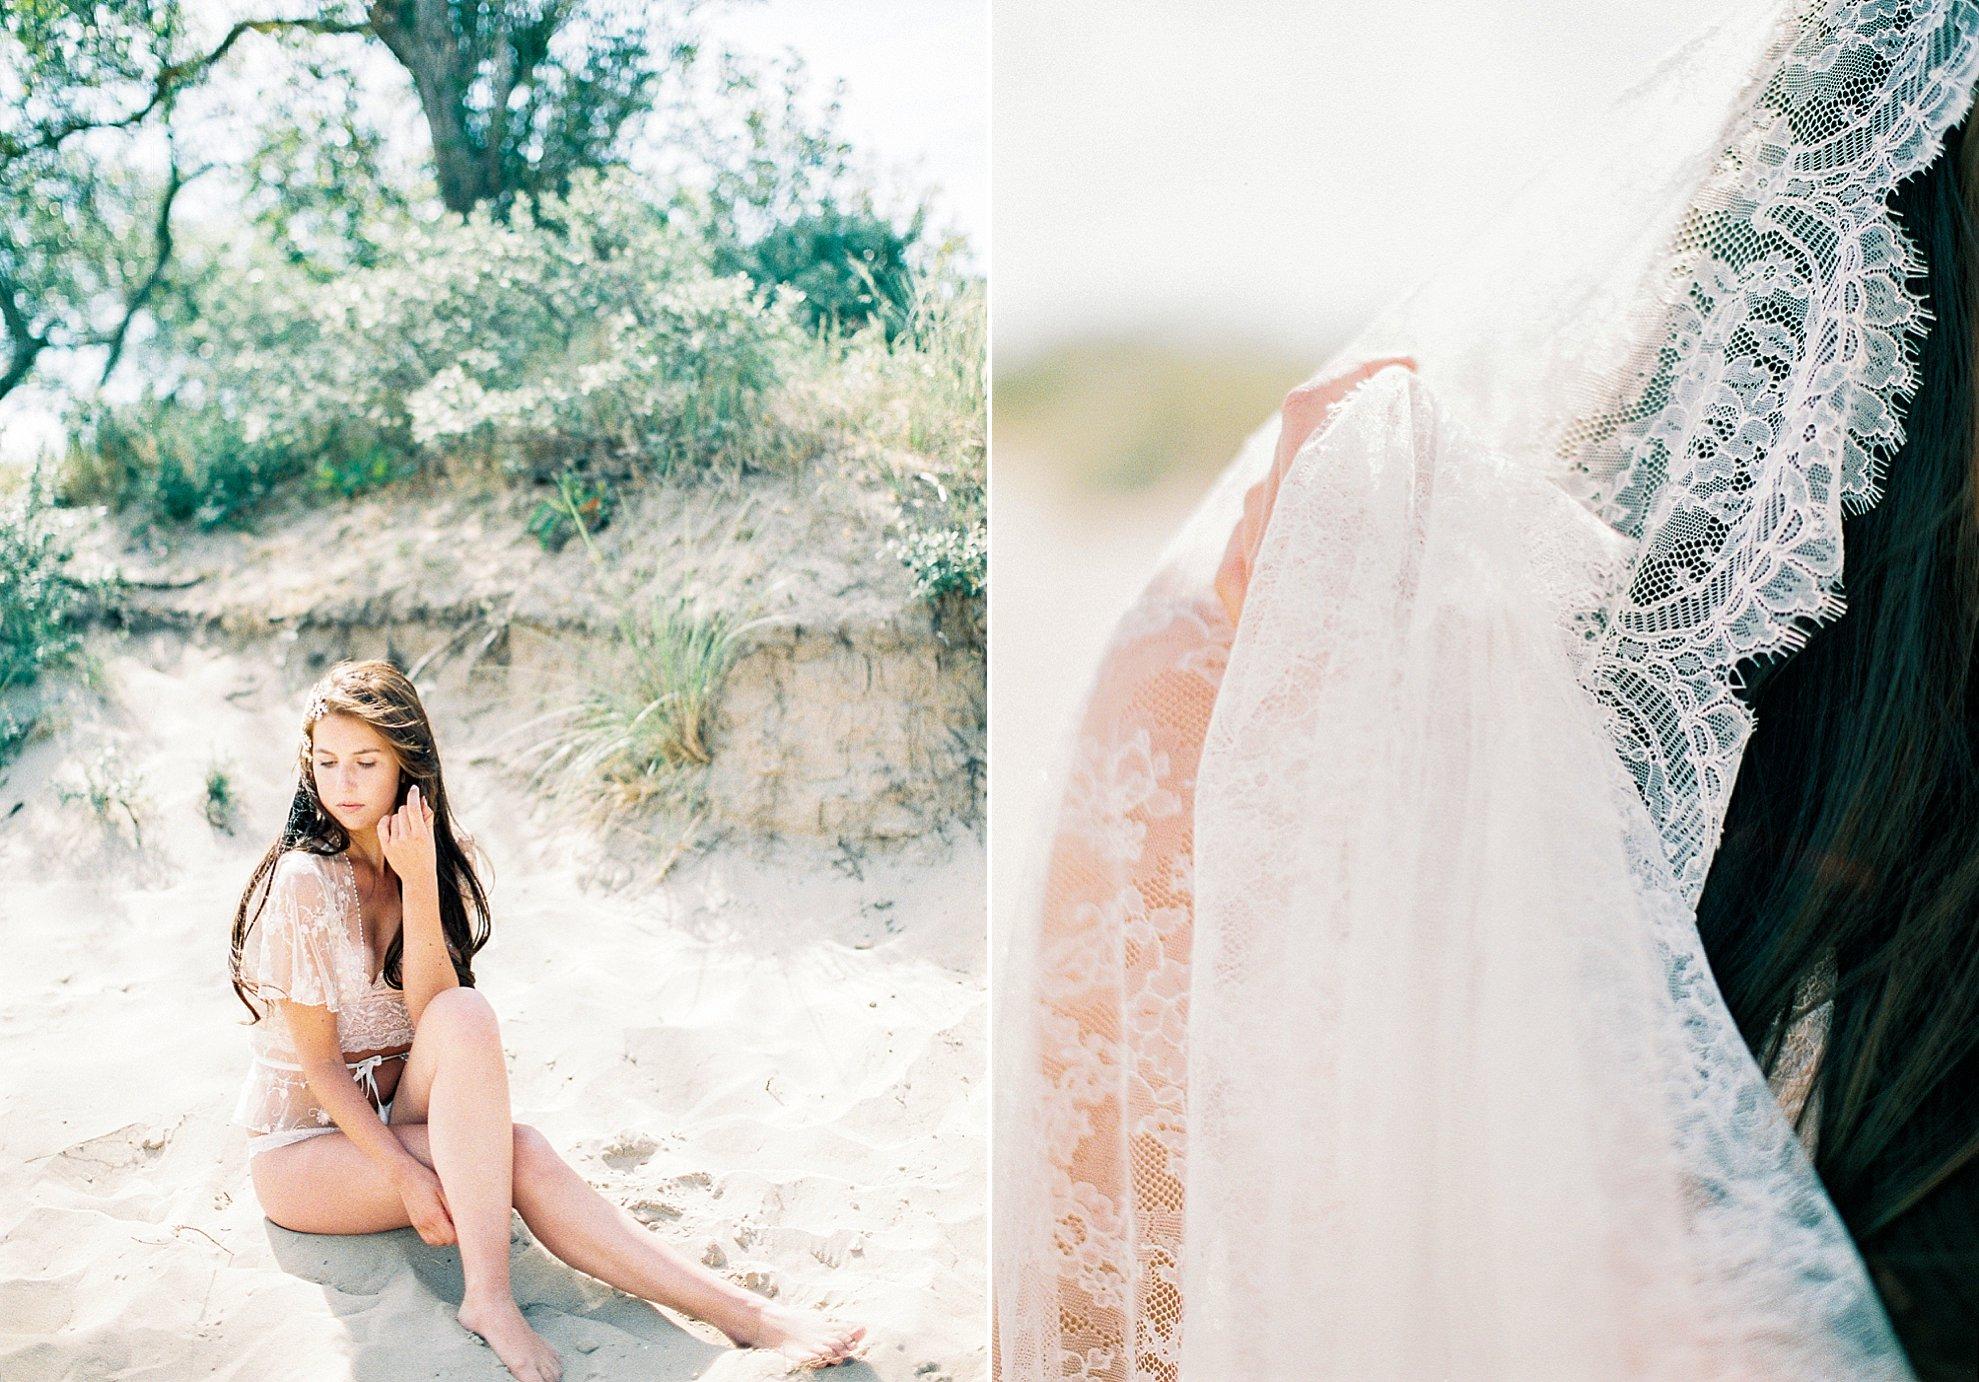 Amanda-Drost-Photography-Fine-Art-Nederland00012.jpg